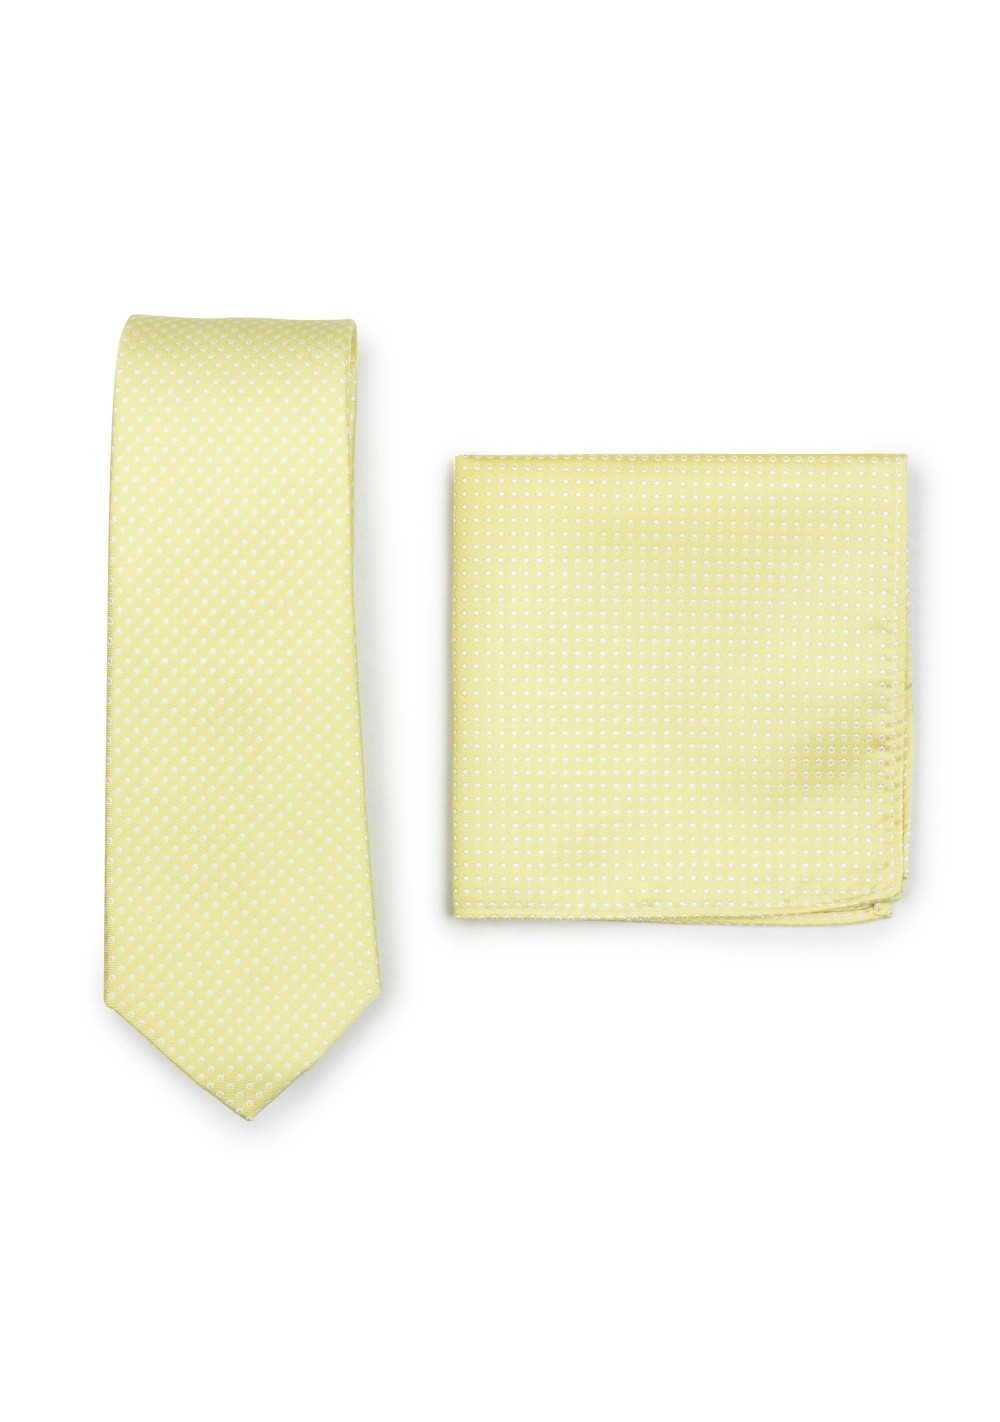 Pastel Yellow Pin Dot Tie and Hanky Set